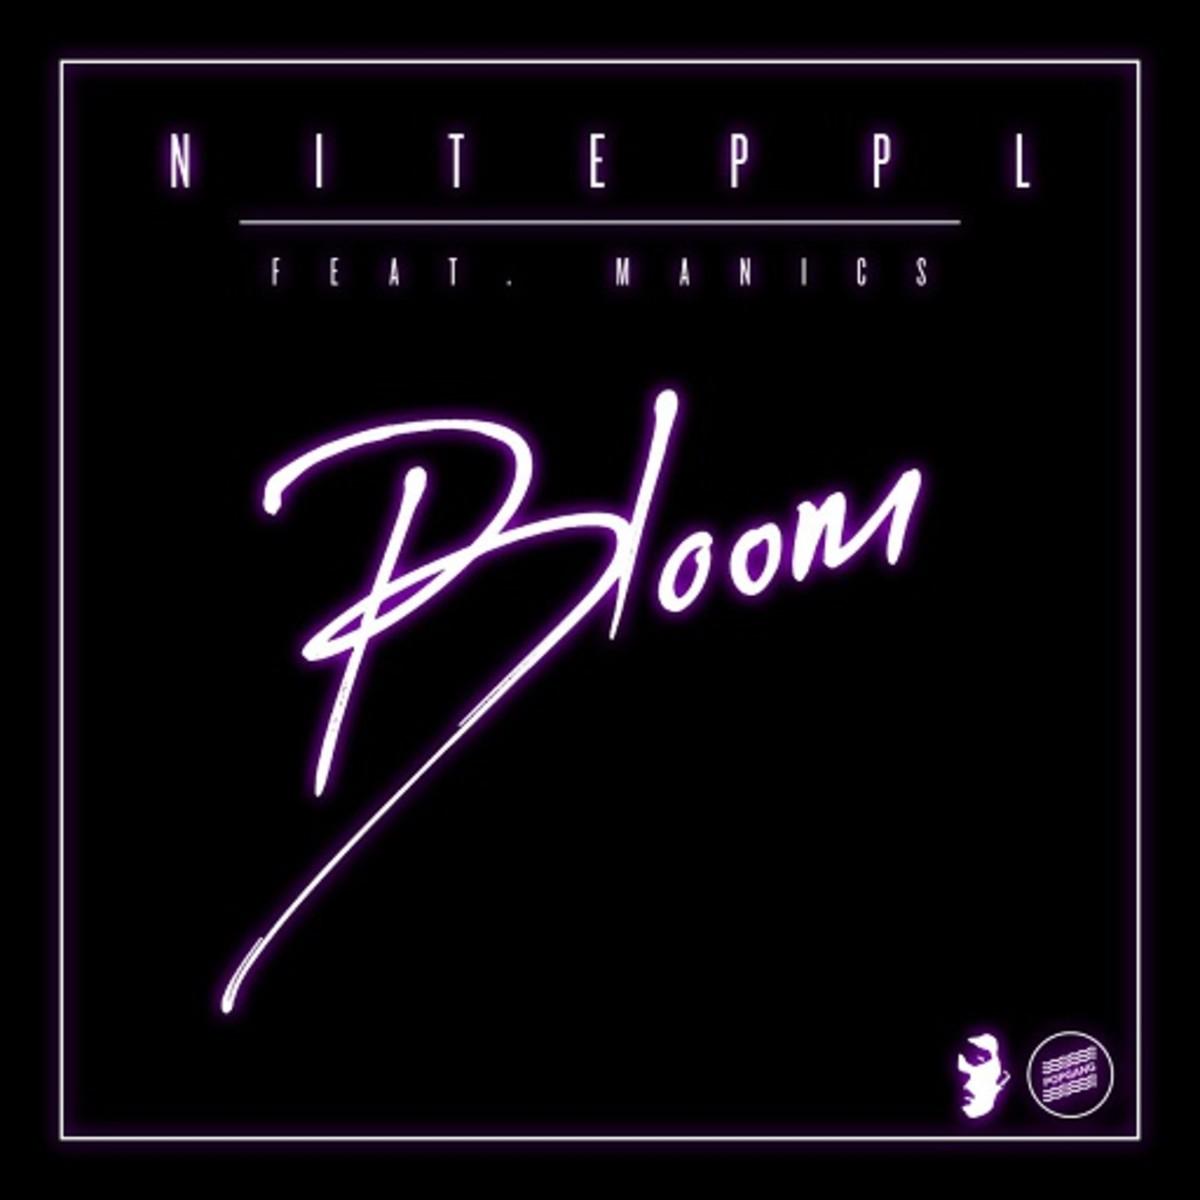 Niteppl - Bloom (Art)